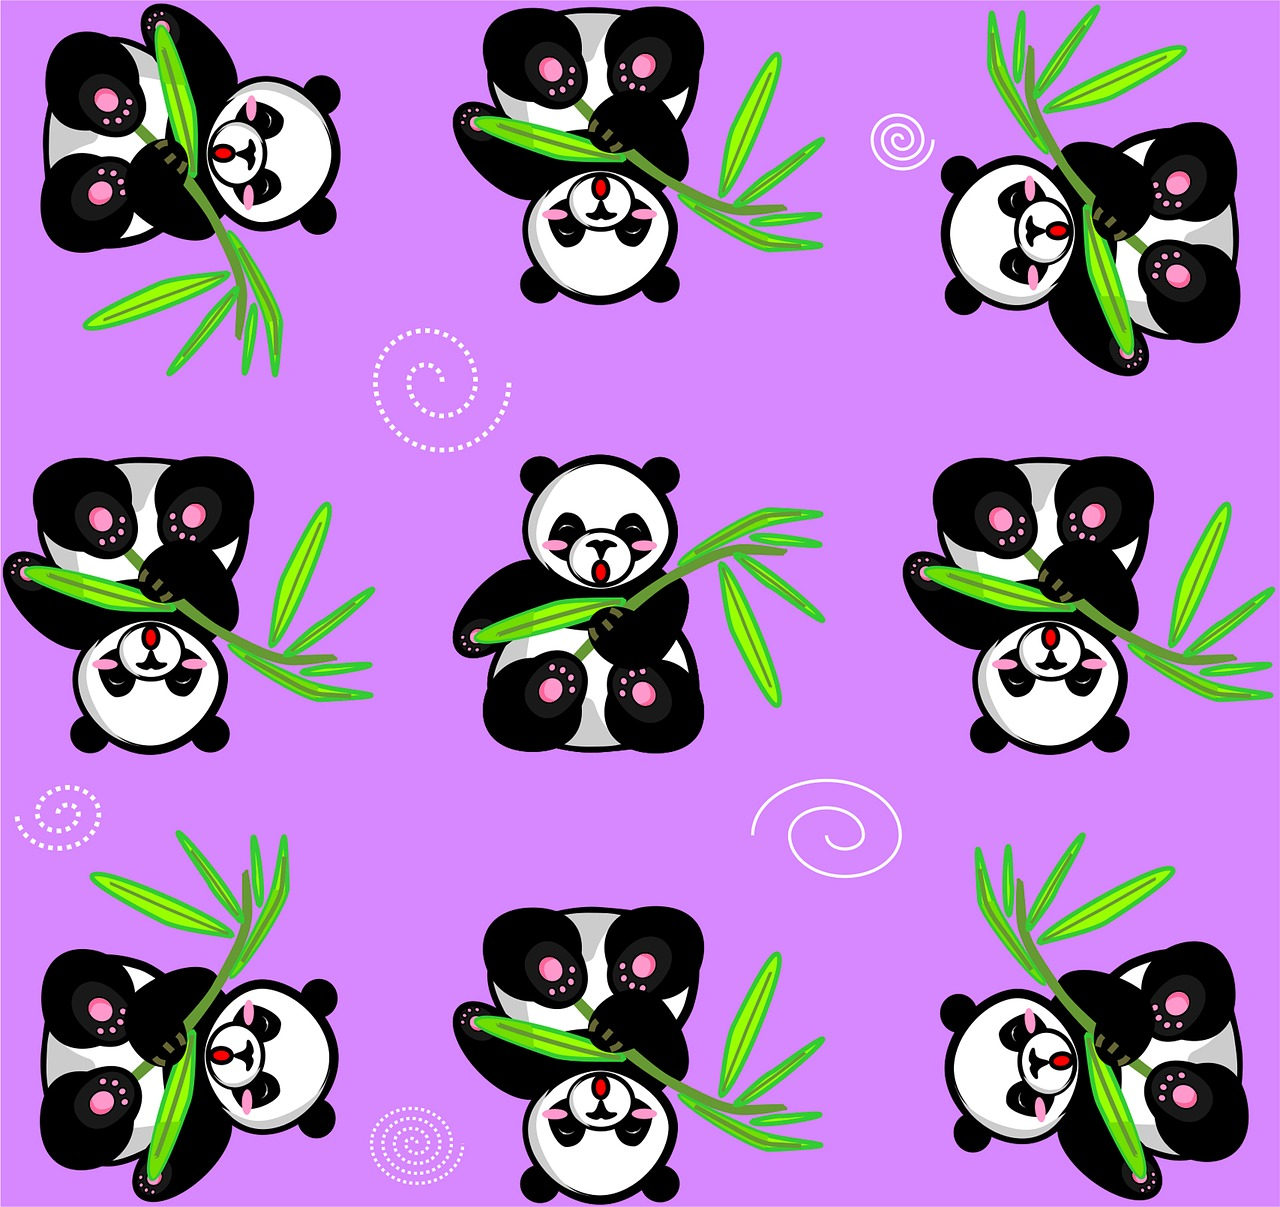 Panda Ungu Bambu Gambar Gratis Di Pixabay